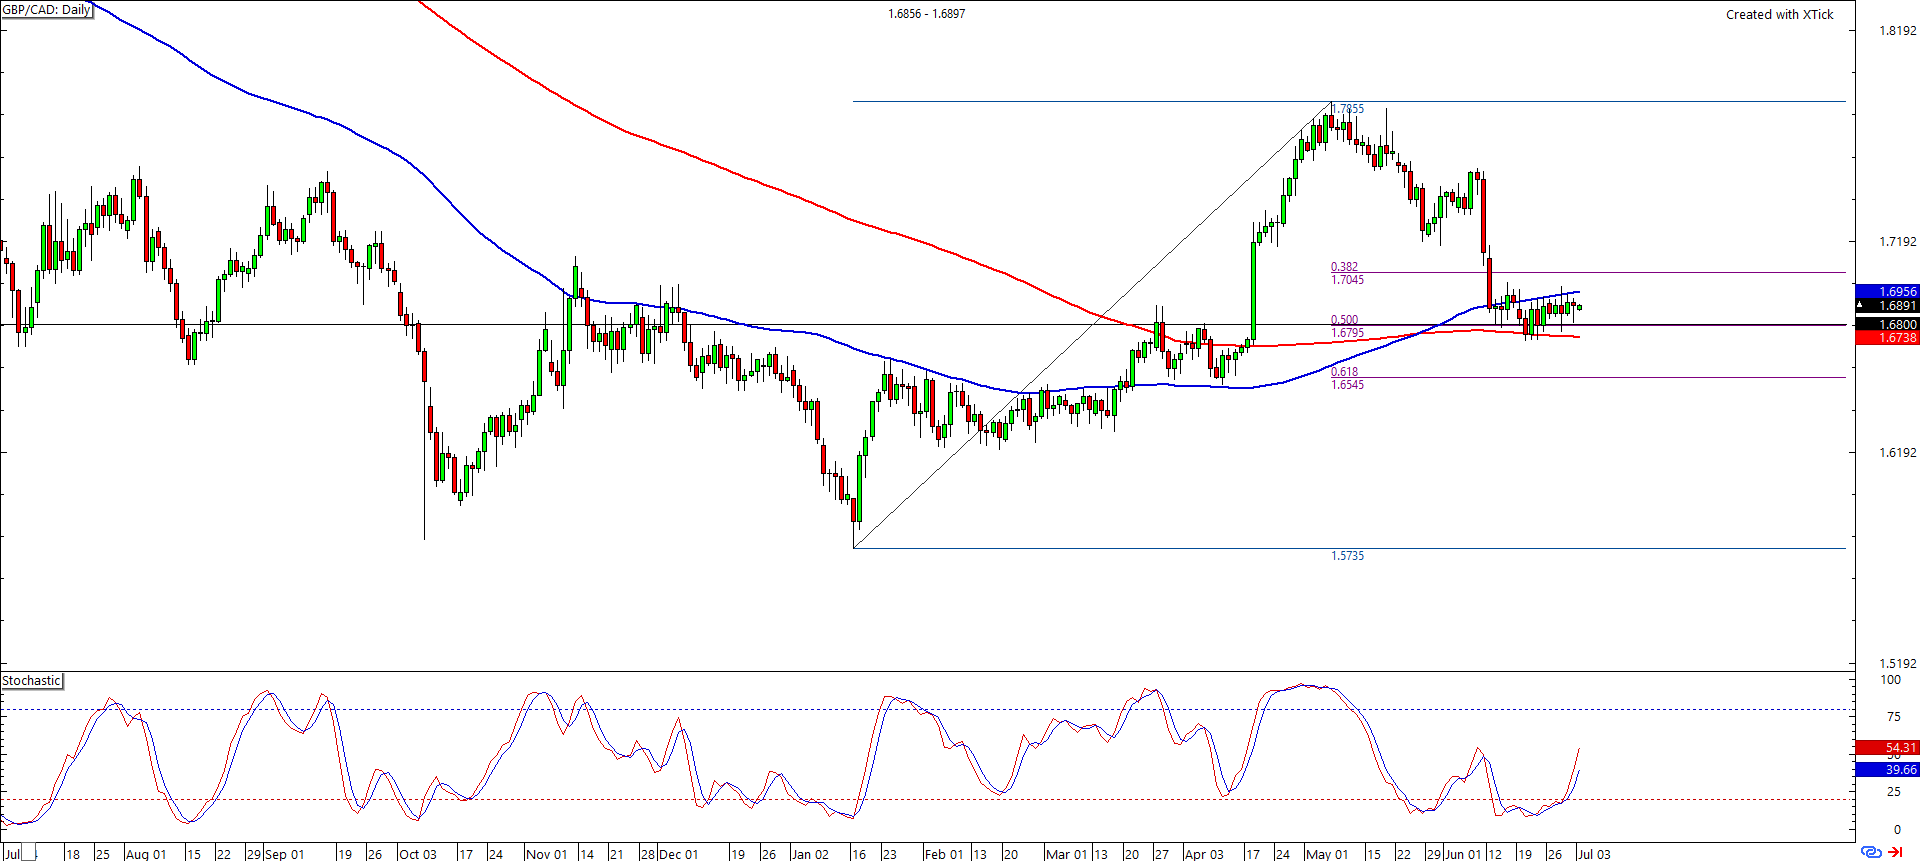 Forex chart gbp/cad